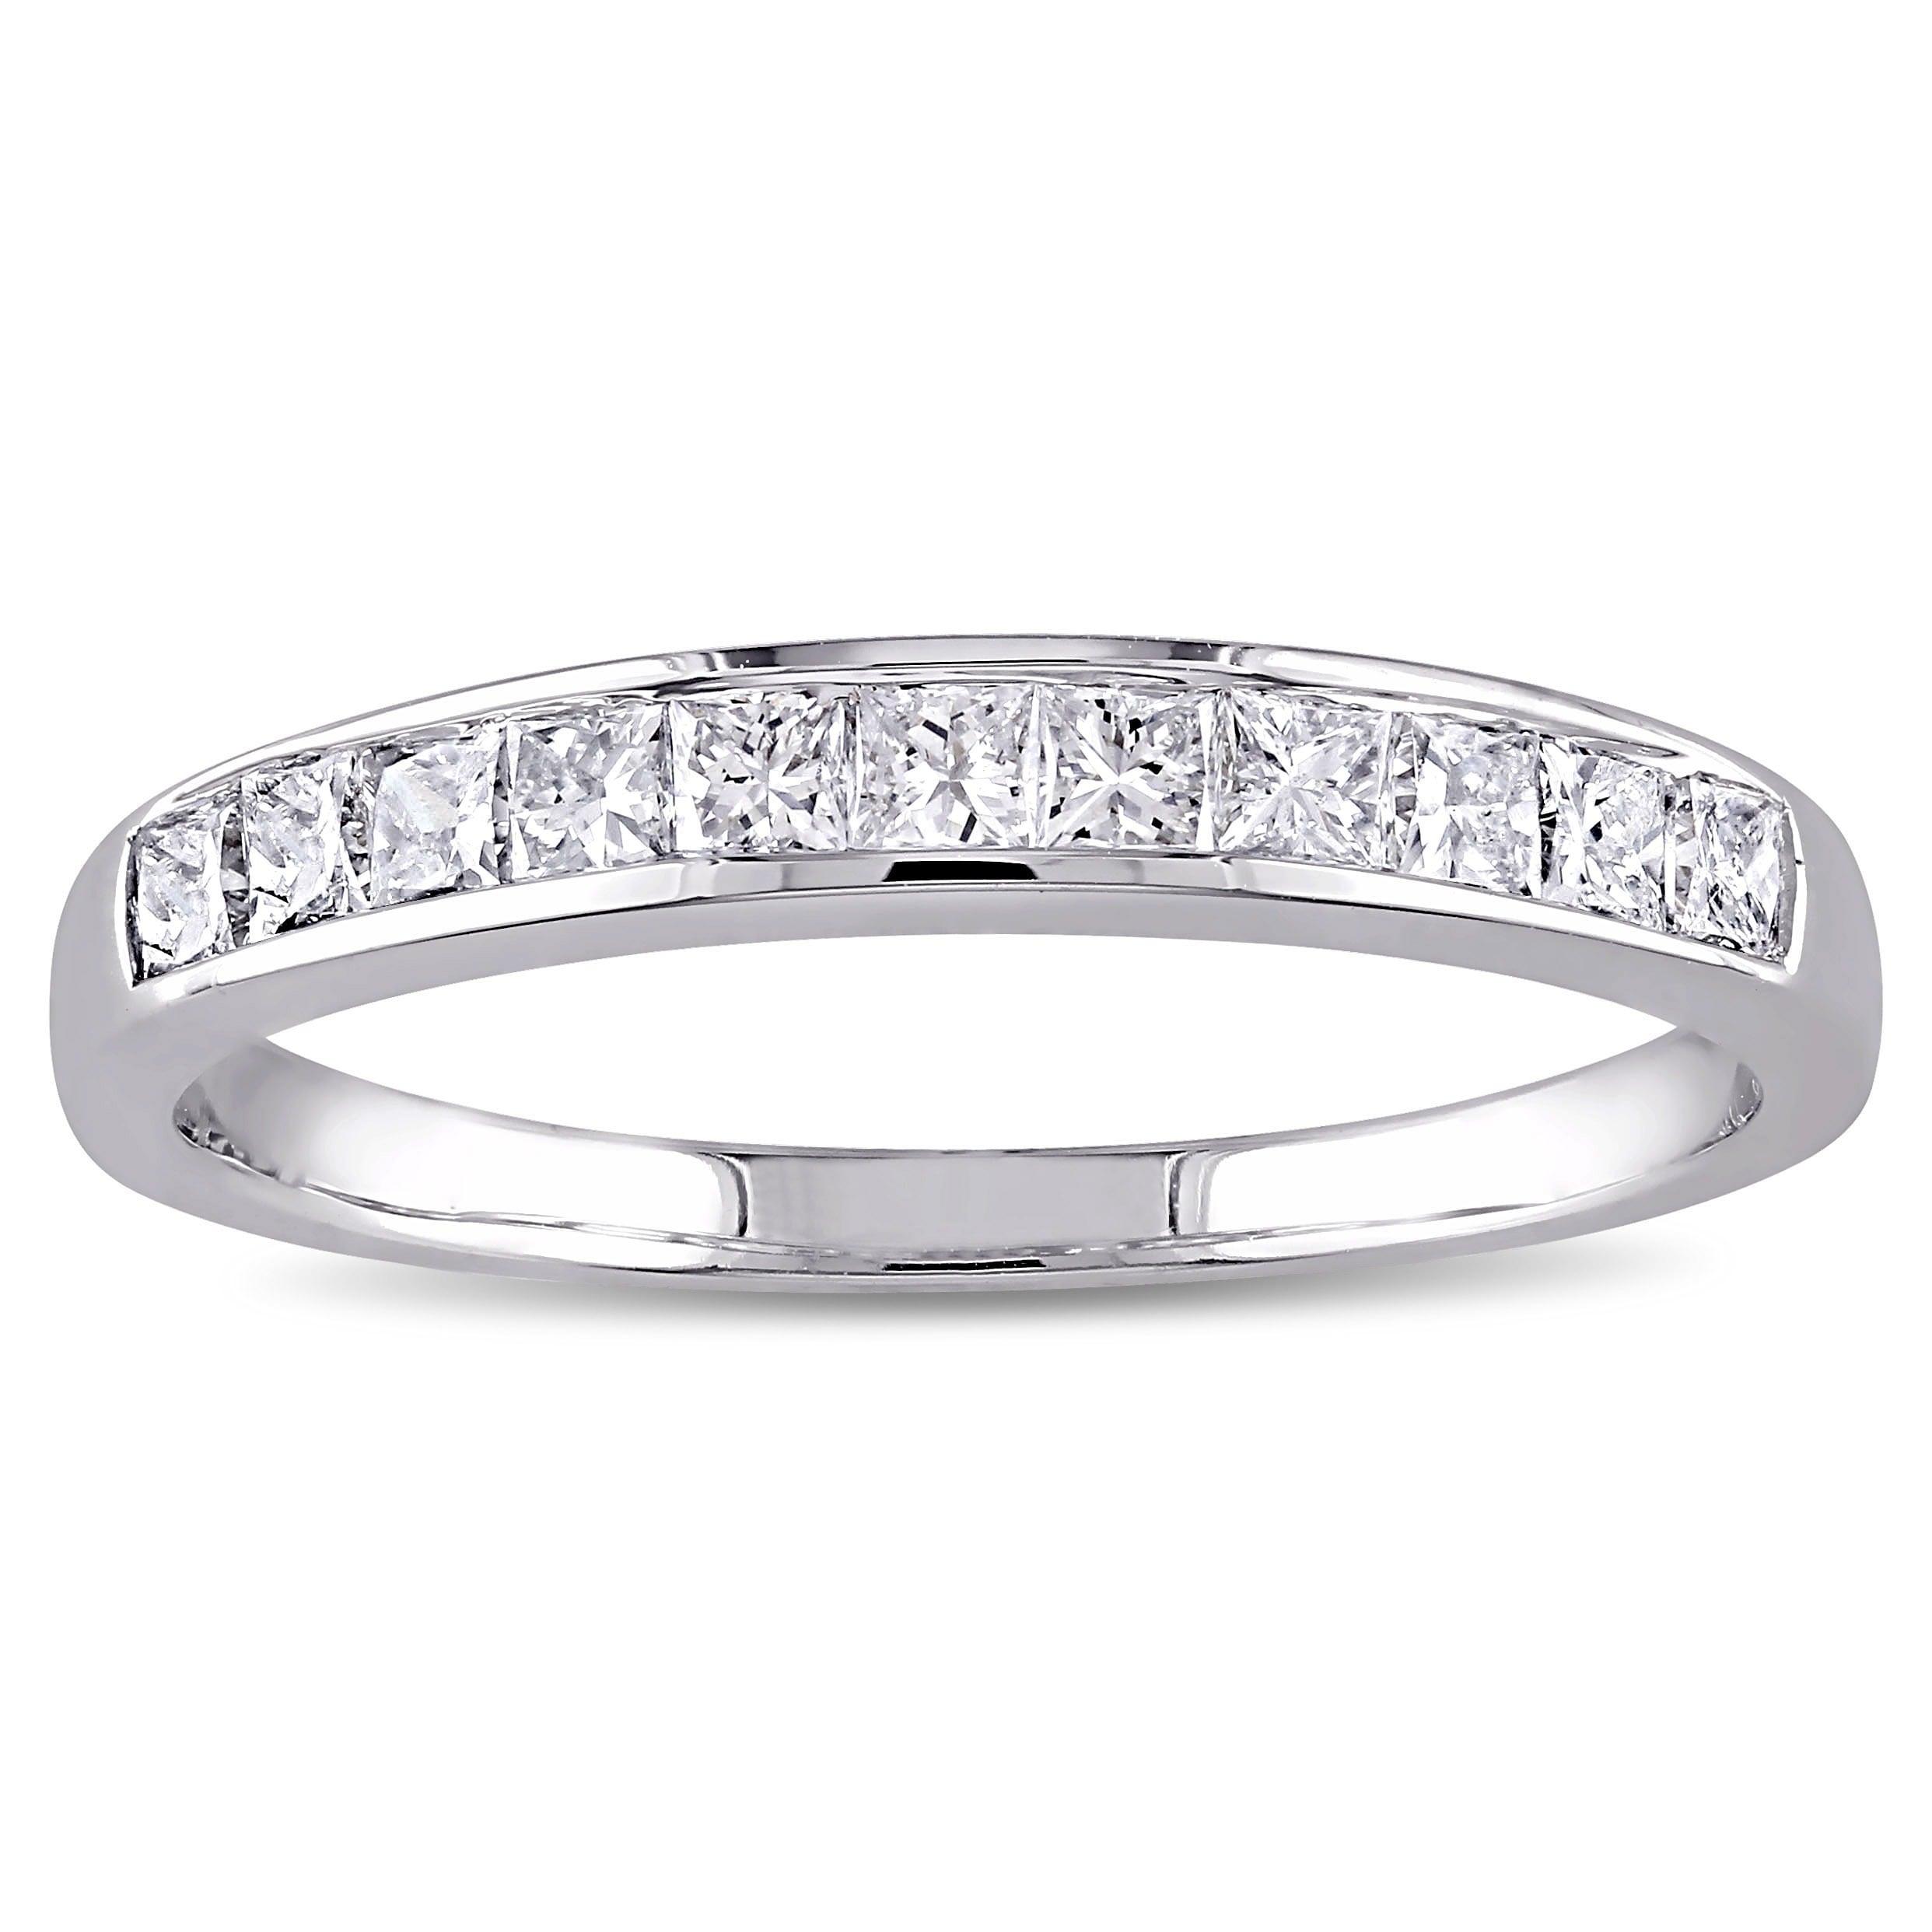 Miadora 14k White Gold 1 2ct Tdw Igl Certified Princess Channel Set Diamond Wedding Band G H I1 I2 On Free Shipping Today